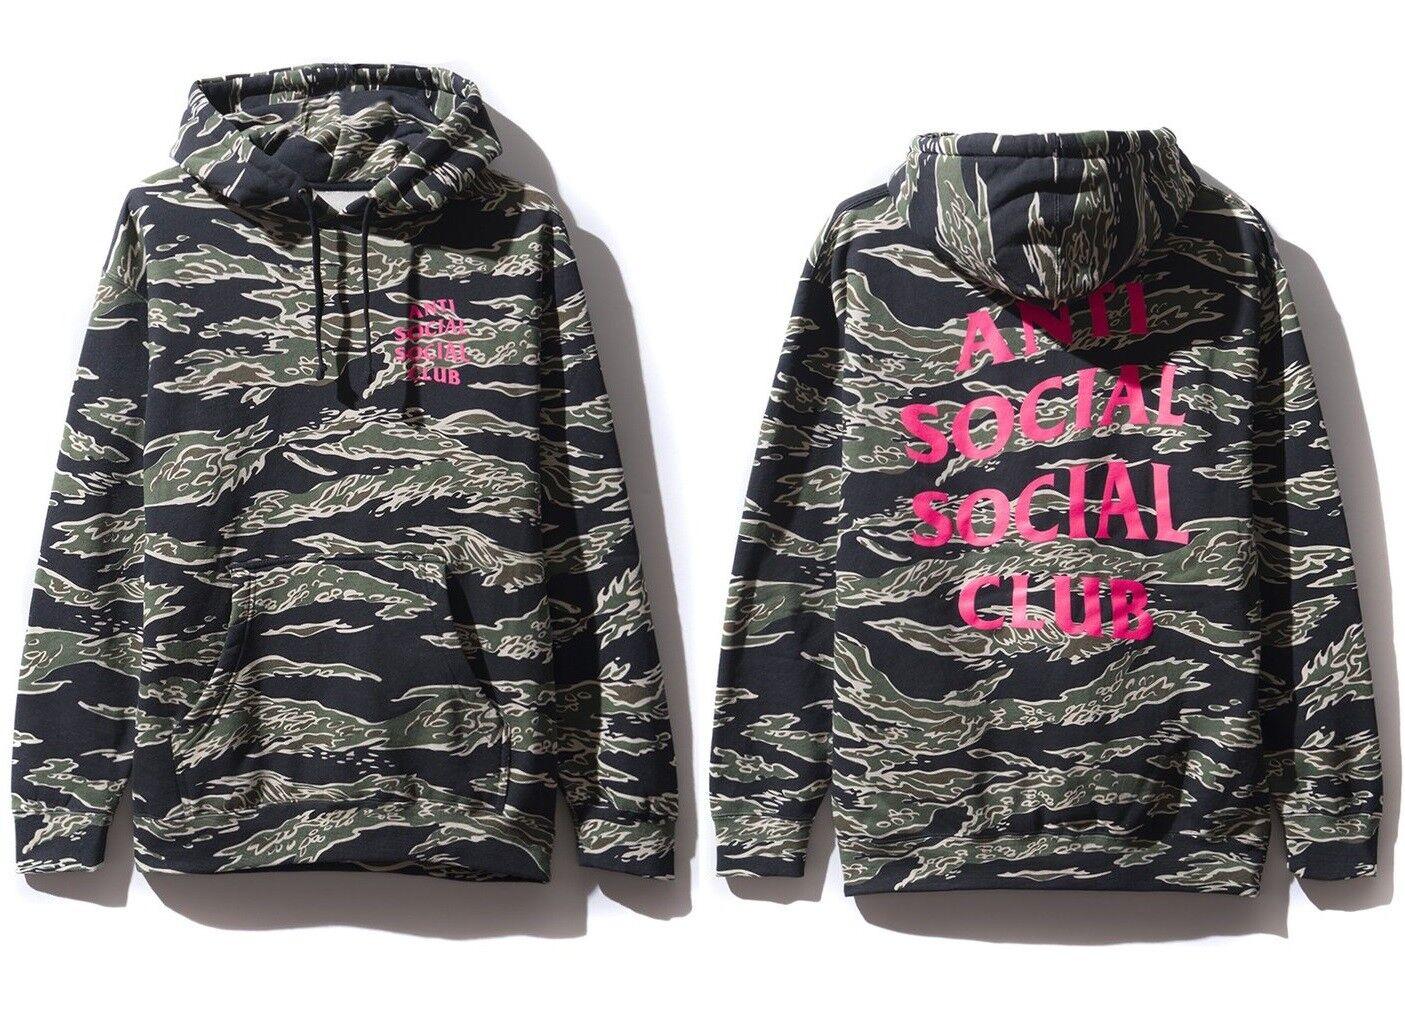 Anti Social Social Club ASSC pink logo Cheetah Tiger shark Camo Hoodie Supreme